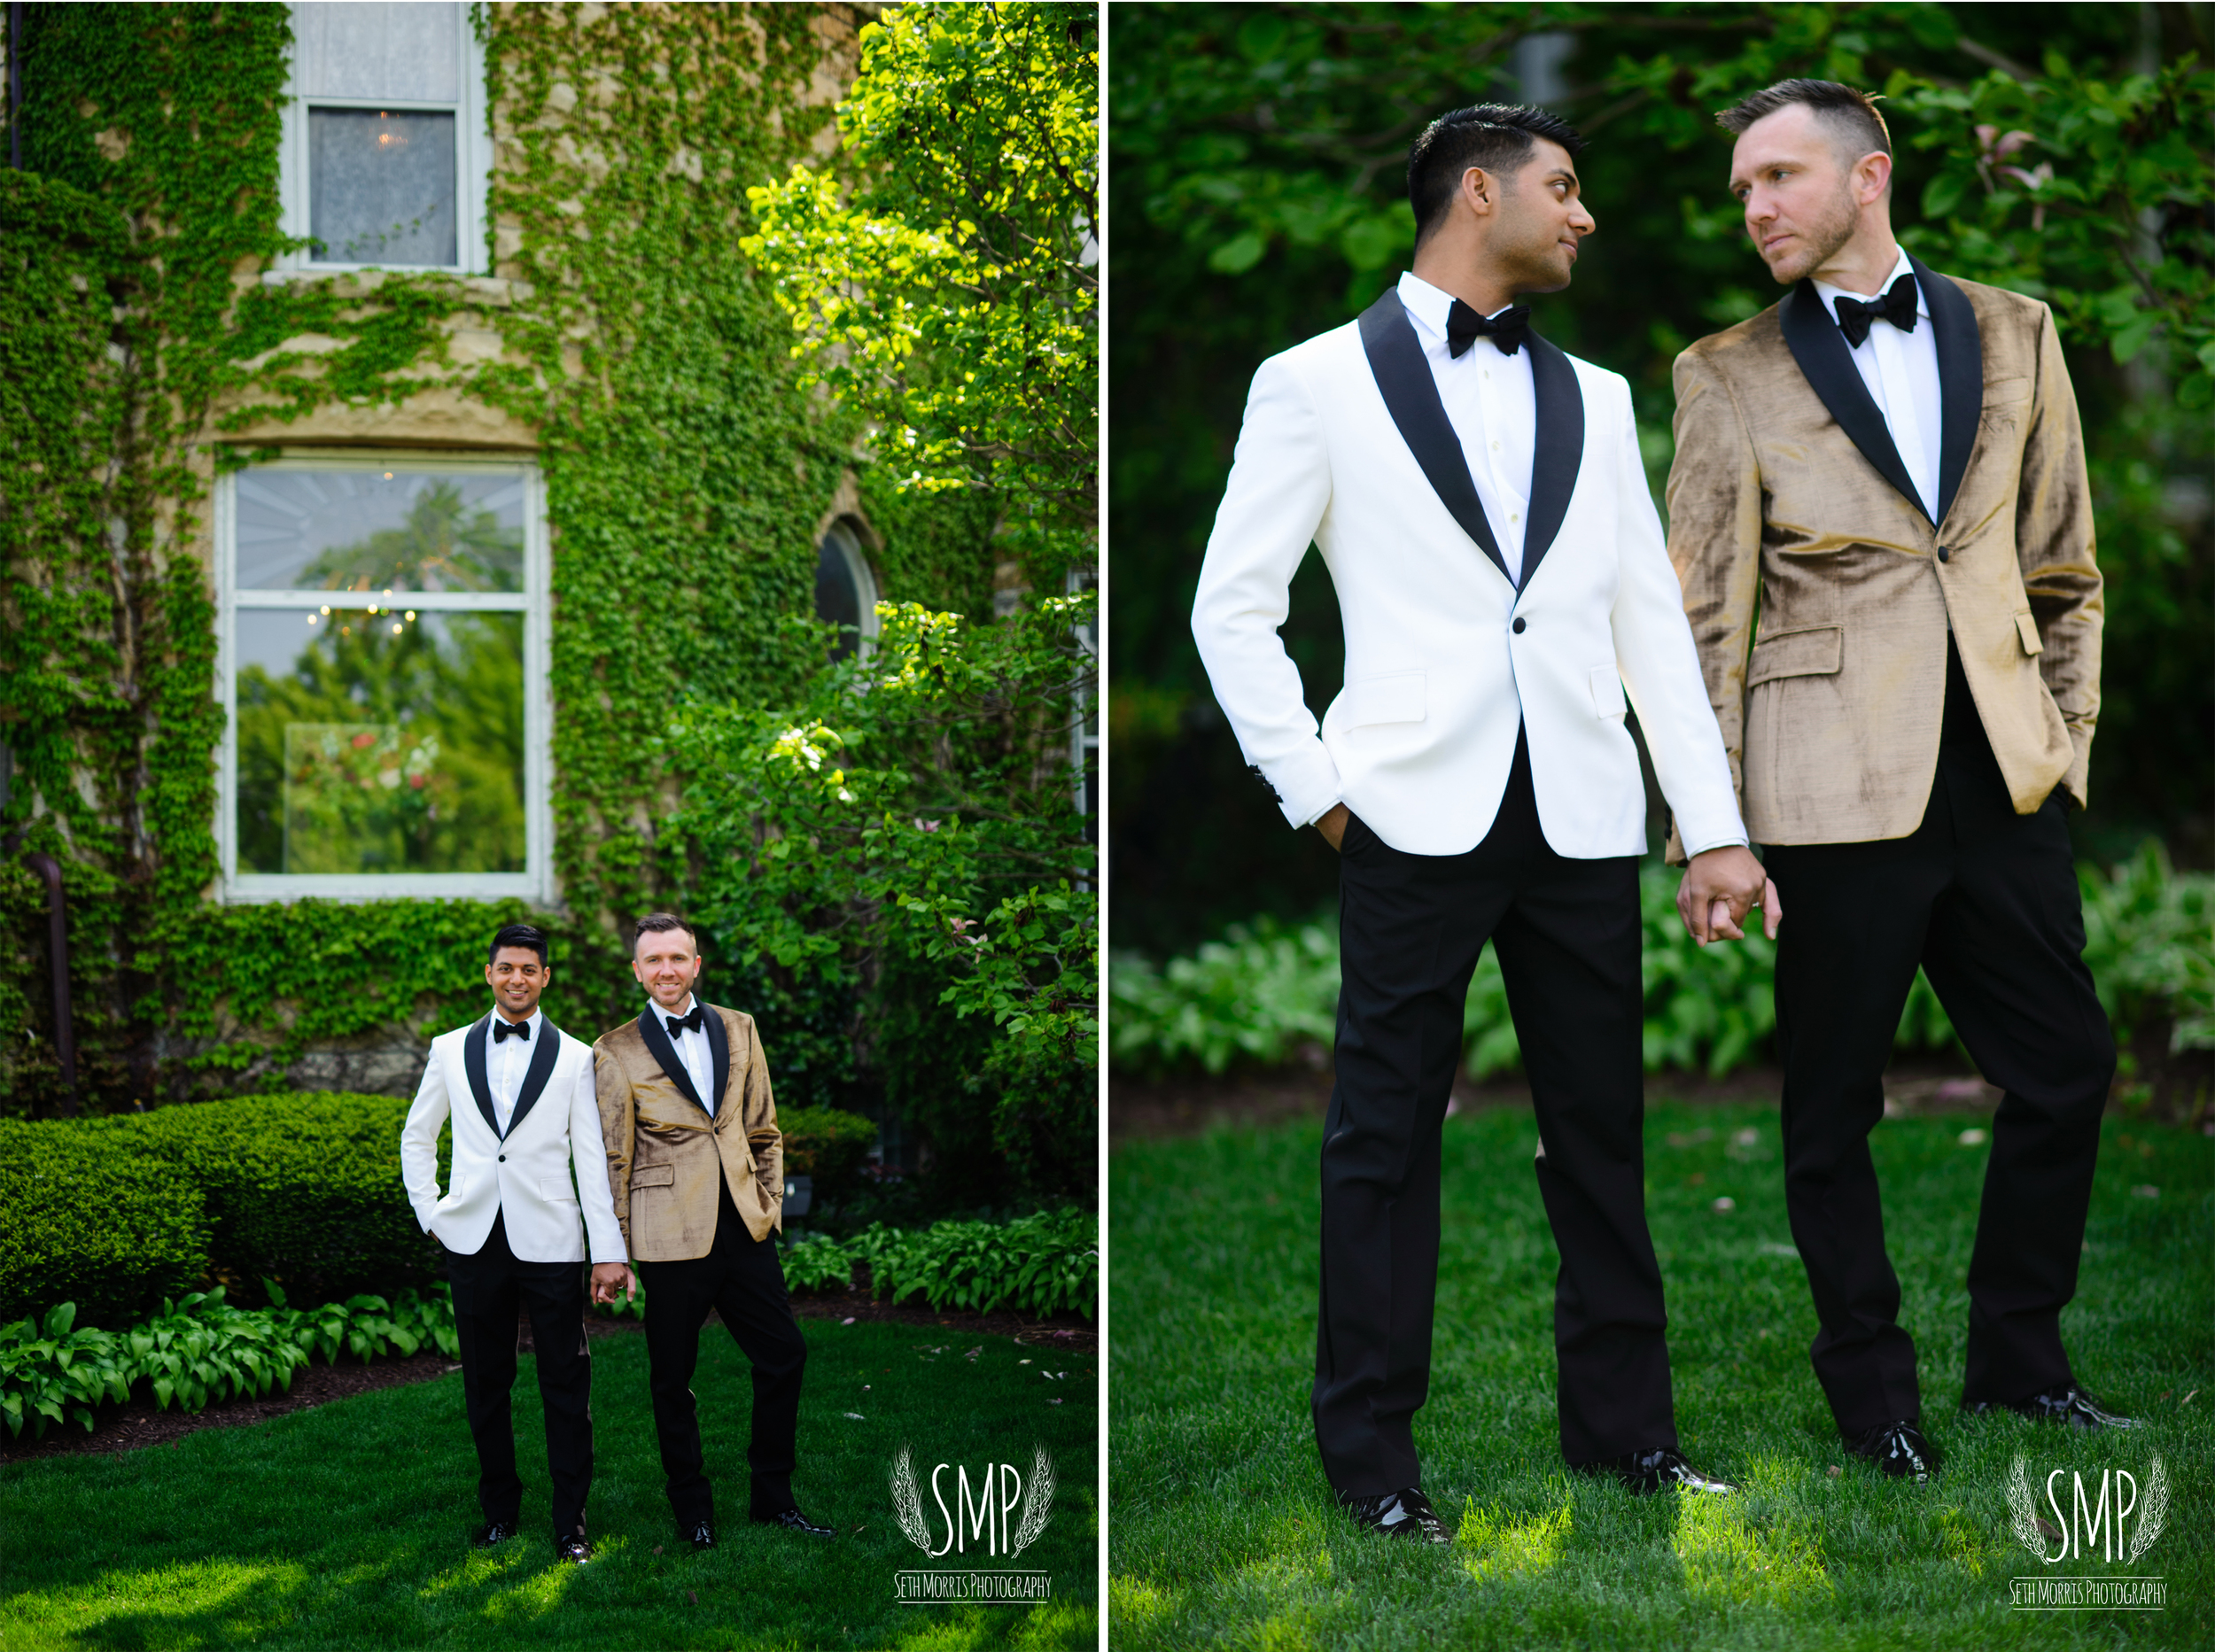 same-sex-wedding-photographer-chicago-illinois-19.jpg